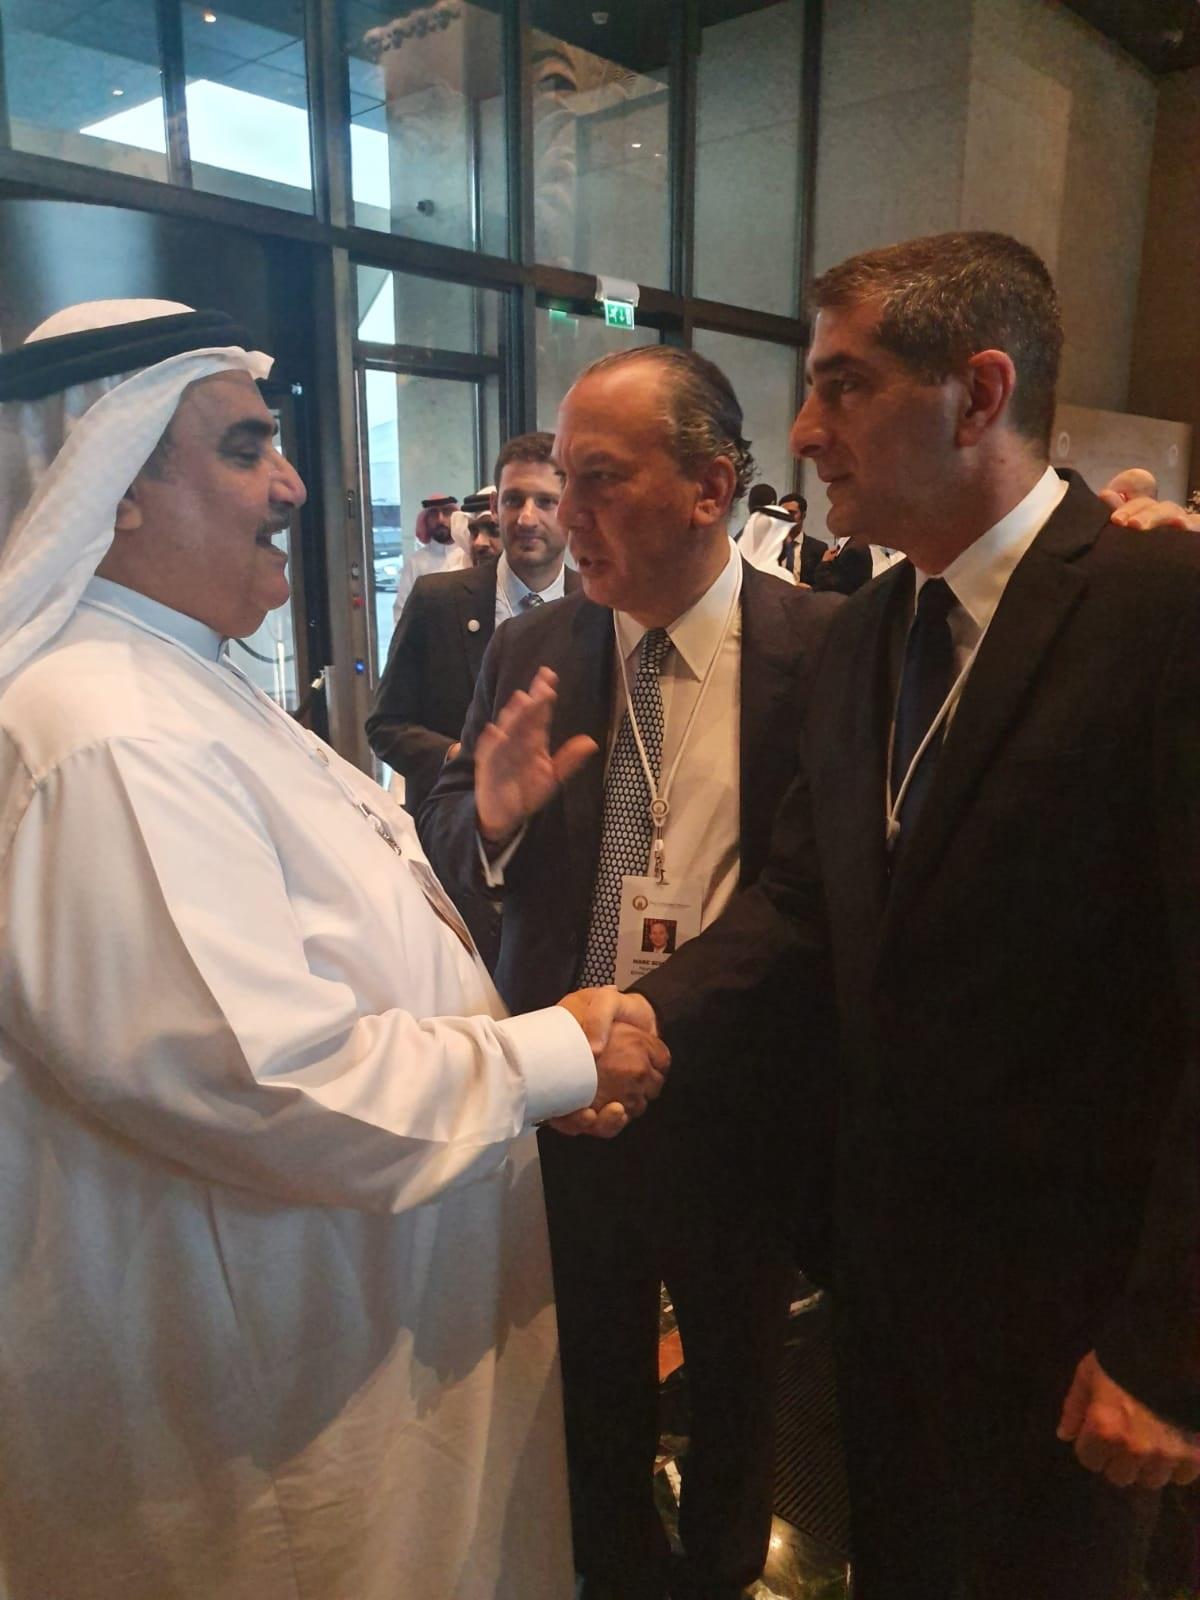 Foreign Minister of Bahrain Sheikh Khalid bin Ahmed Mohammed Al Khalifa, NY Rabbi Marc Schneier and Prof. Kreiss.jpg